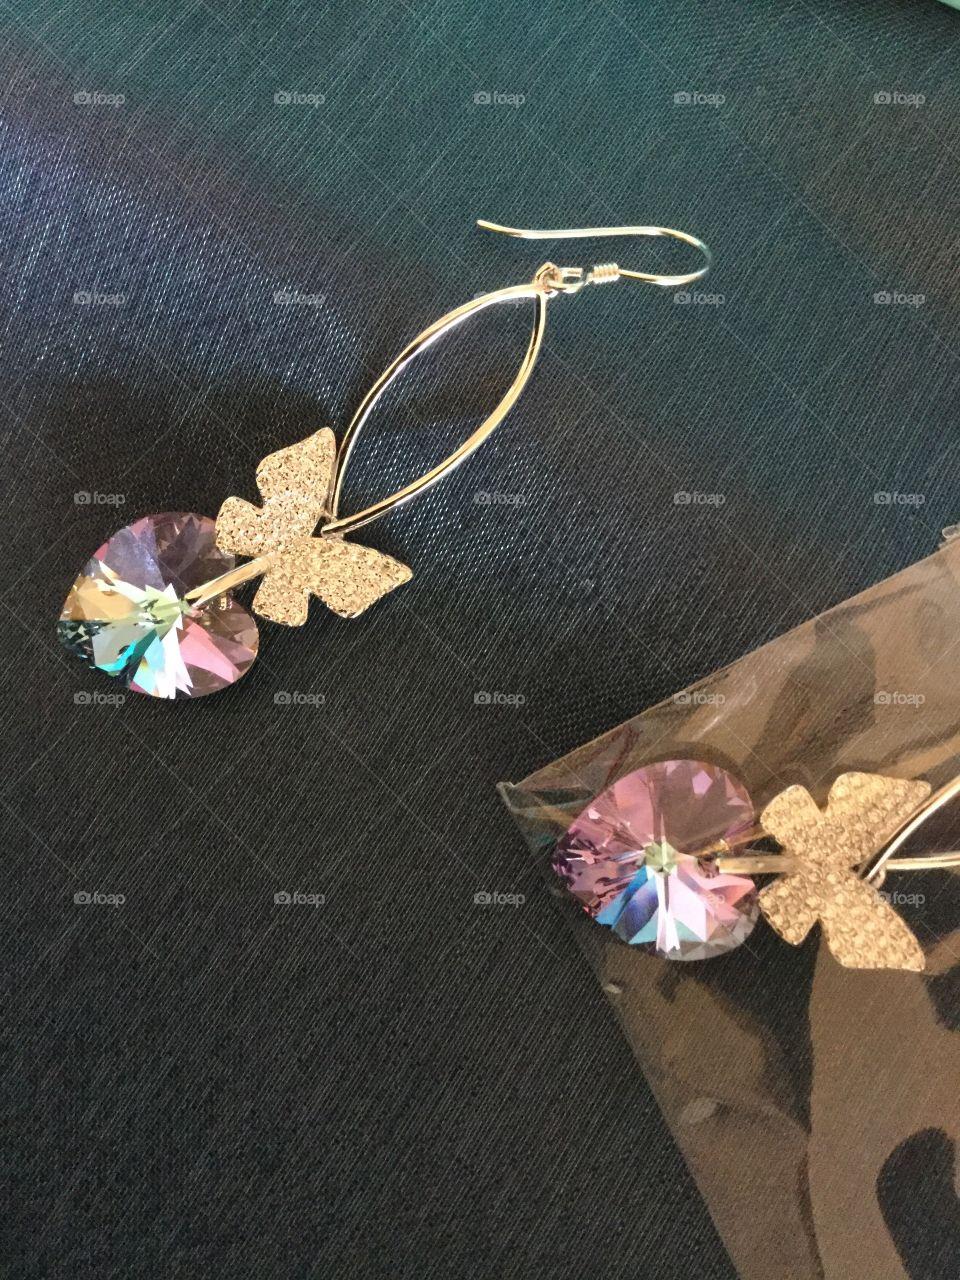 Eva's Crystal hart earrings